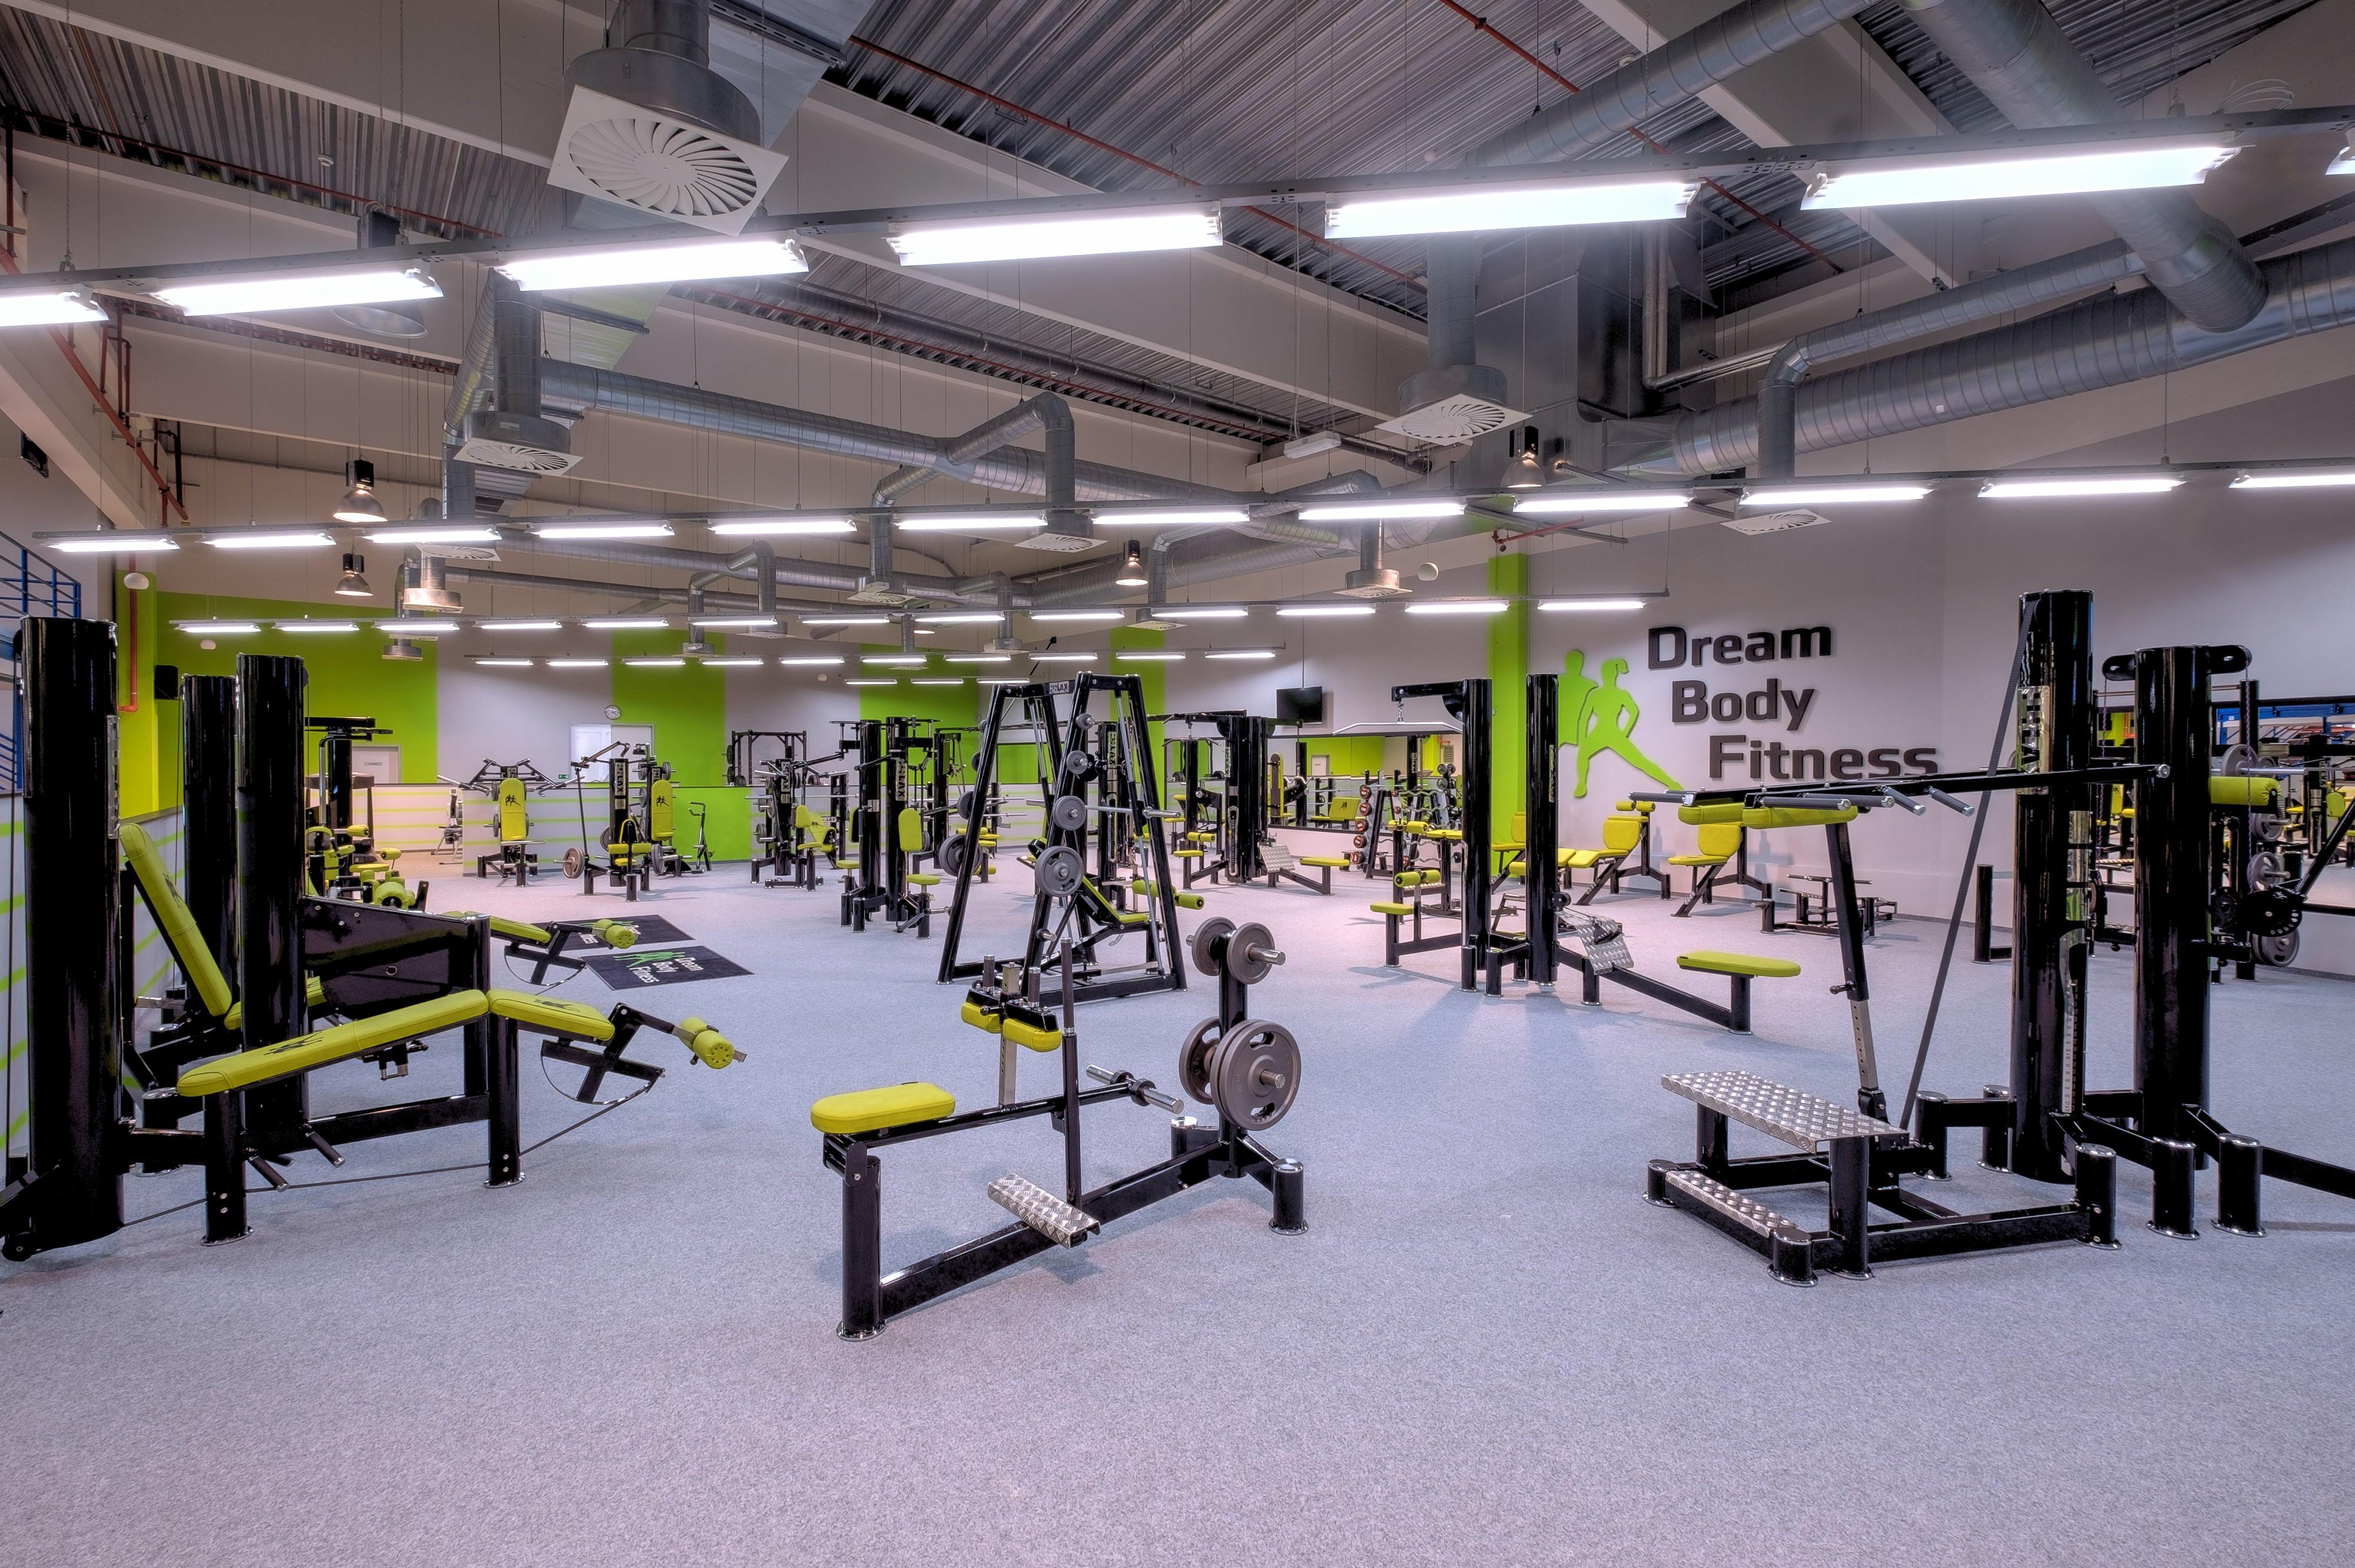 nutricni-terapeut-dram-body-fitness